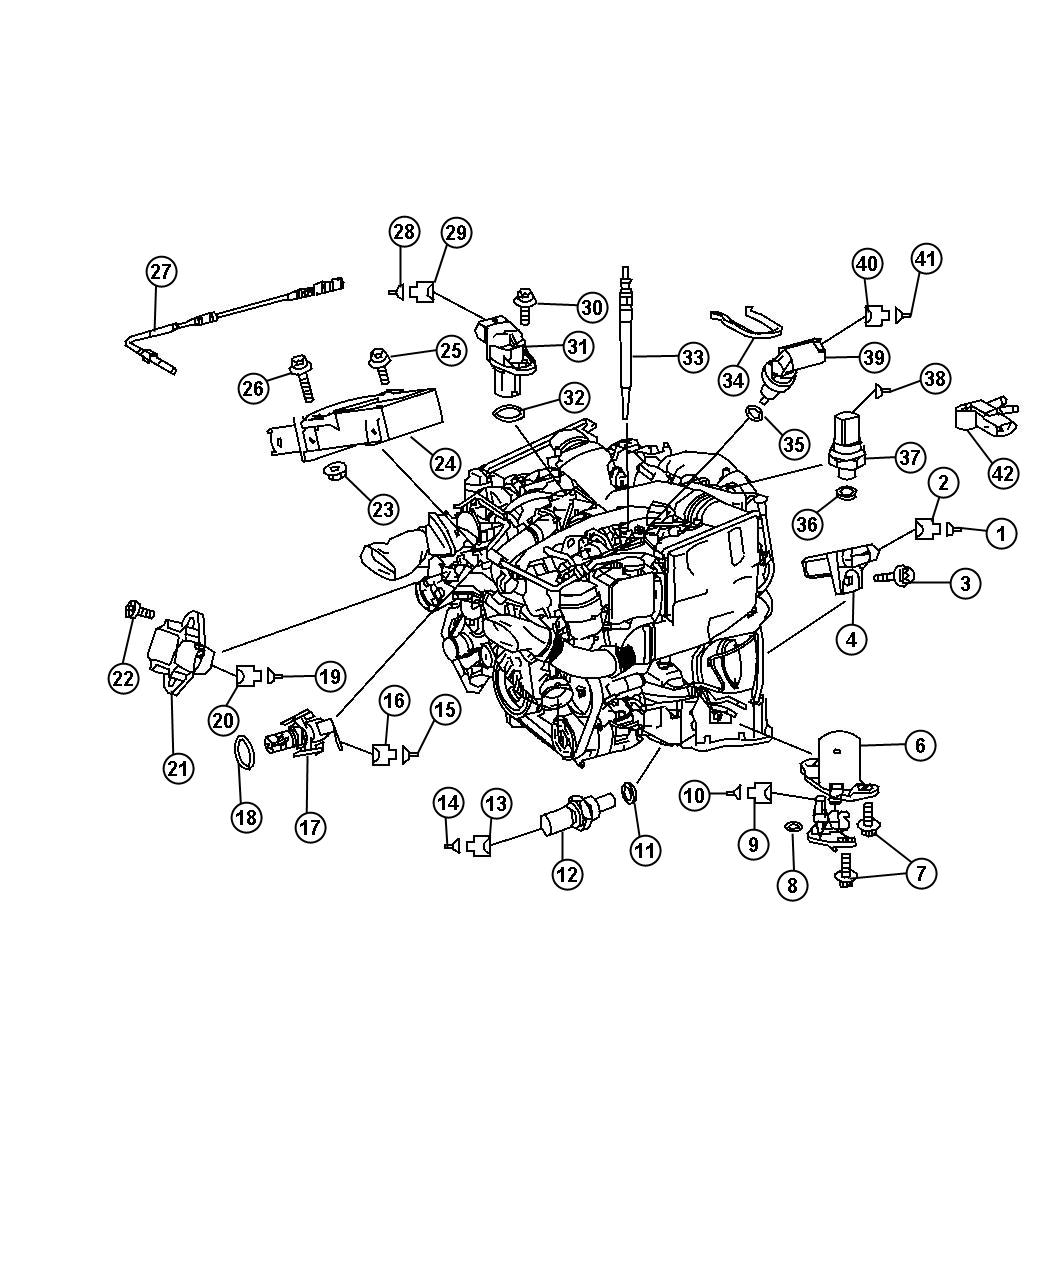 Dodge Sprinter Sensor Oil Level Sensors Engine